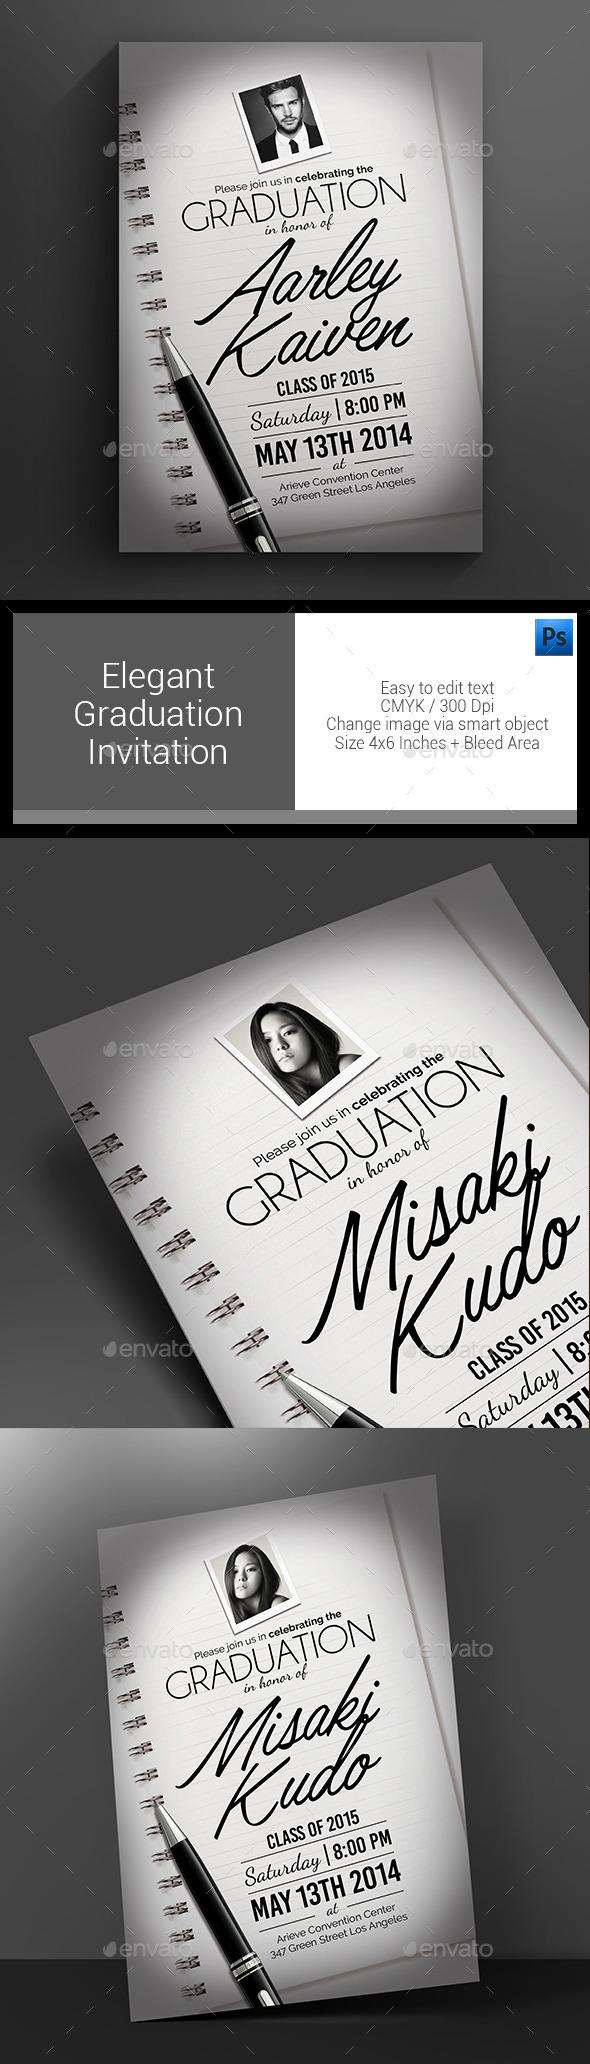 GraphicRiver Elegant Graduation Invitation 11384829